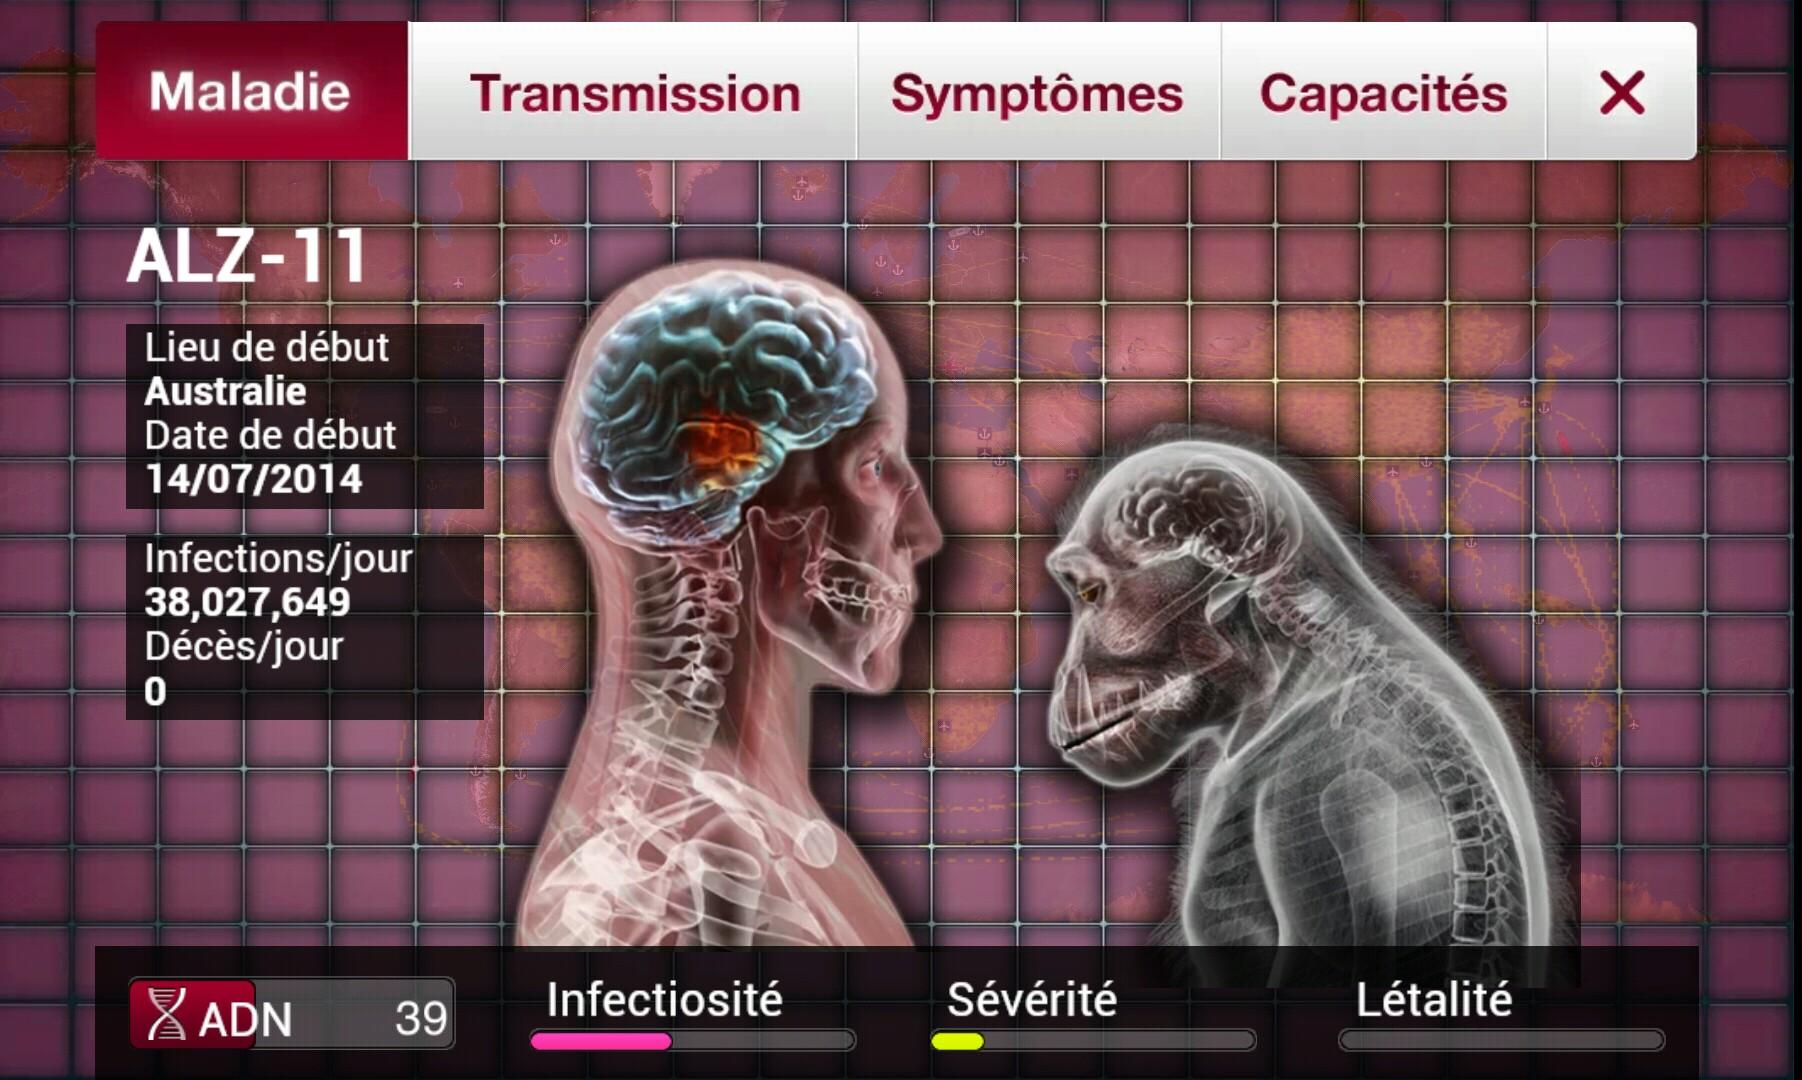 Etat du virus dans Plague Inc.